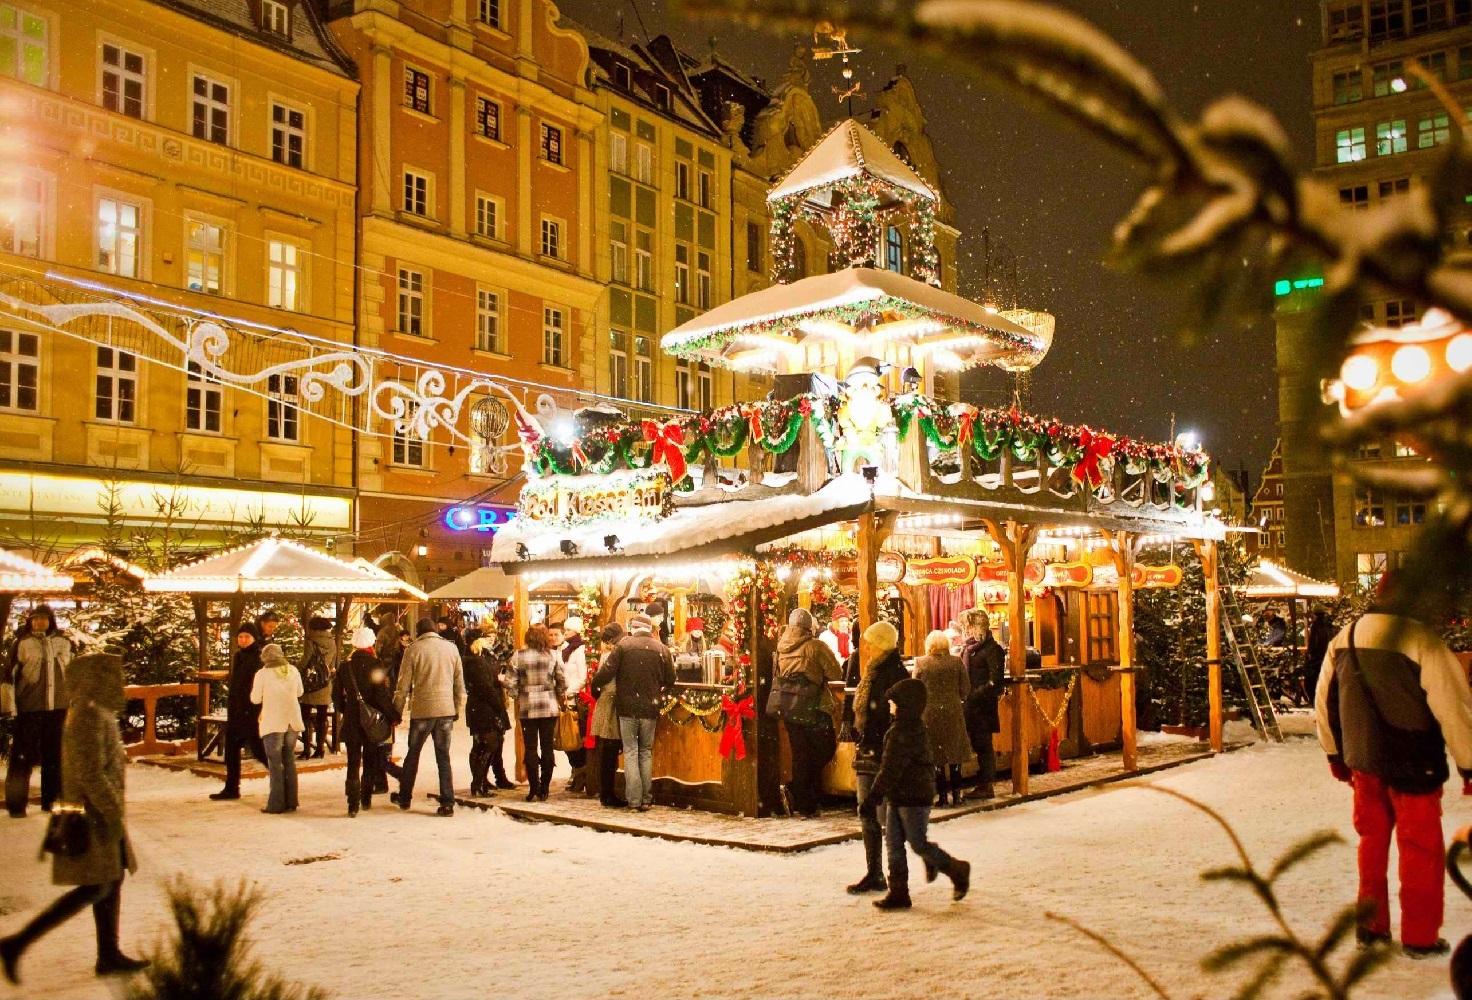 Jarmark Bozonarodzeniowy  - Piața de Crăciun din Breslavia